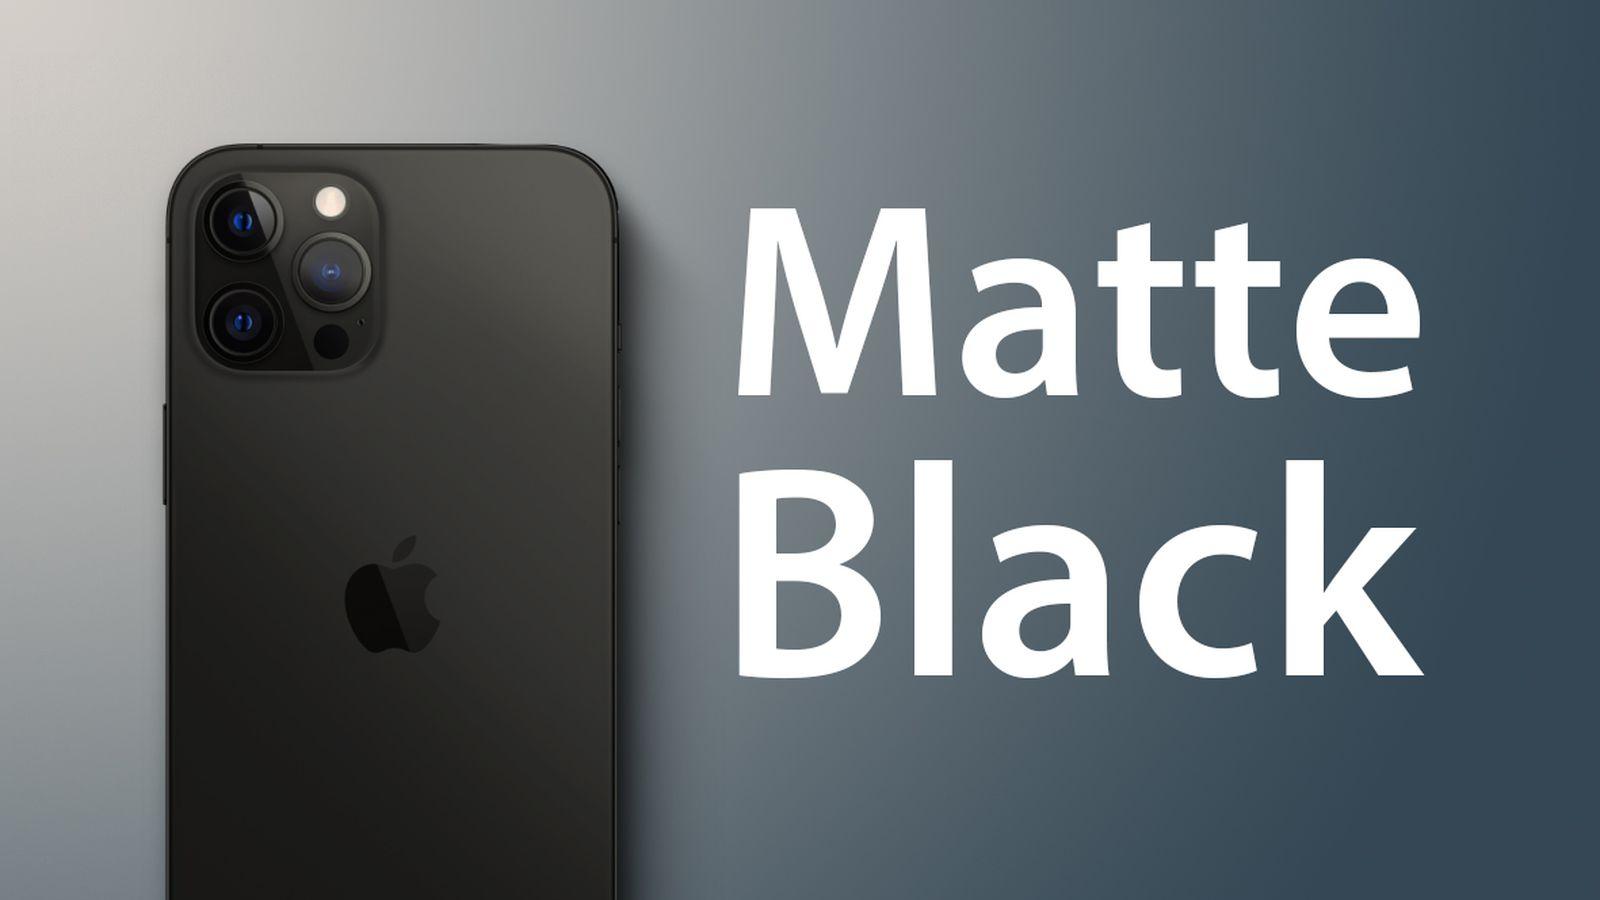 iPhone 13 to Come in Matte Black - MacRumors